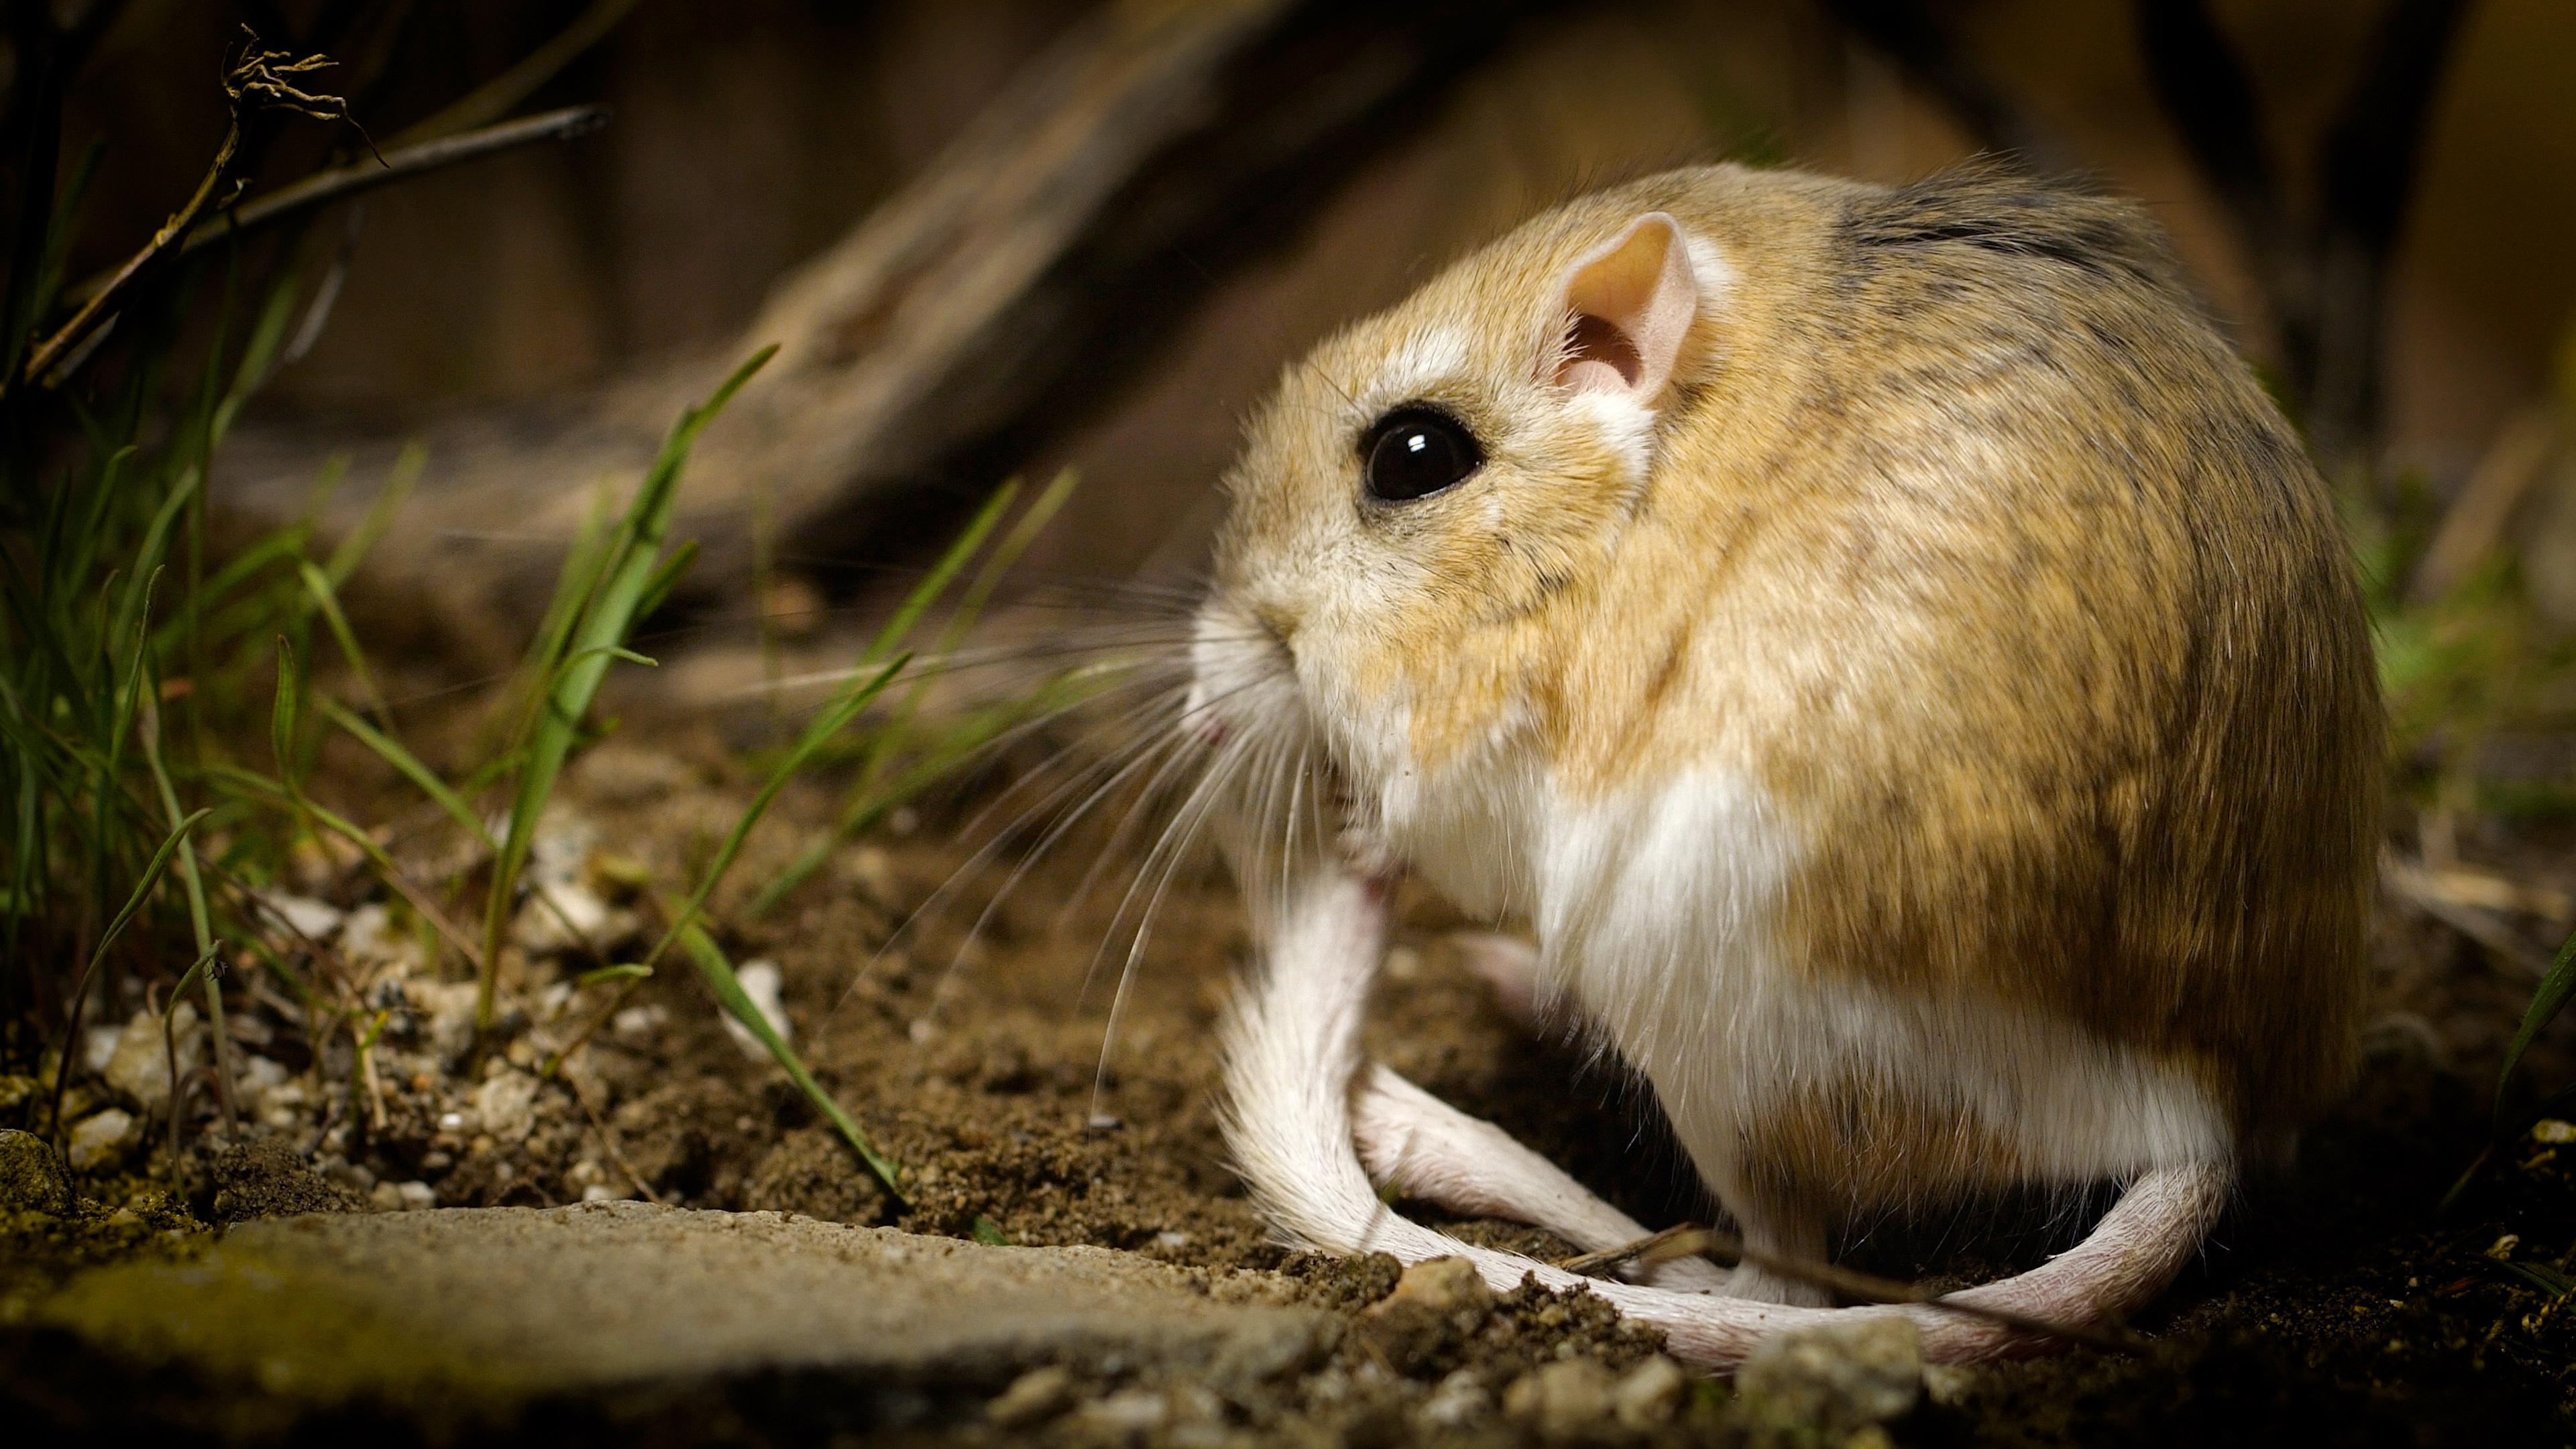 Deep Look Kangaroo Rats Are Furry Spring Loaded Ninjas Season 7 Episode 4 Pbs